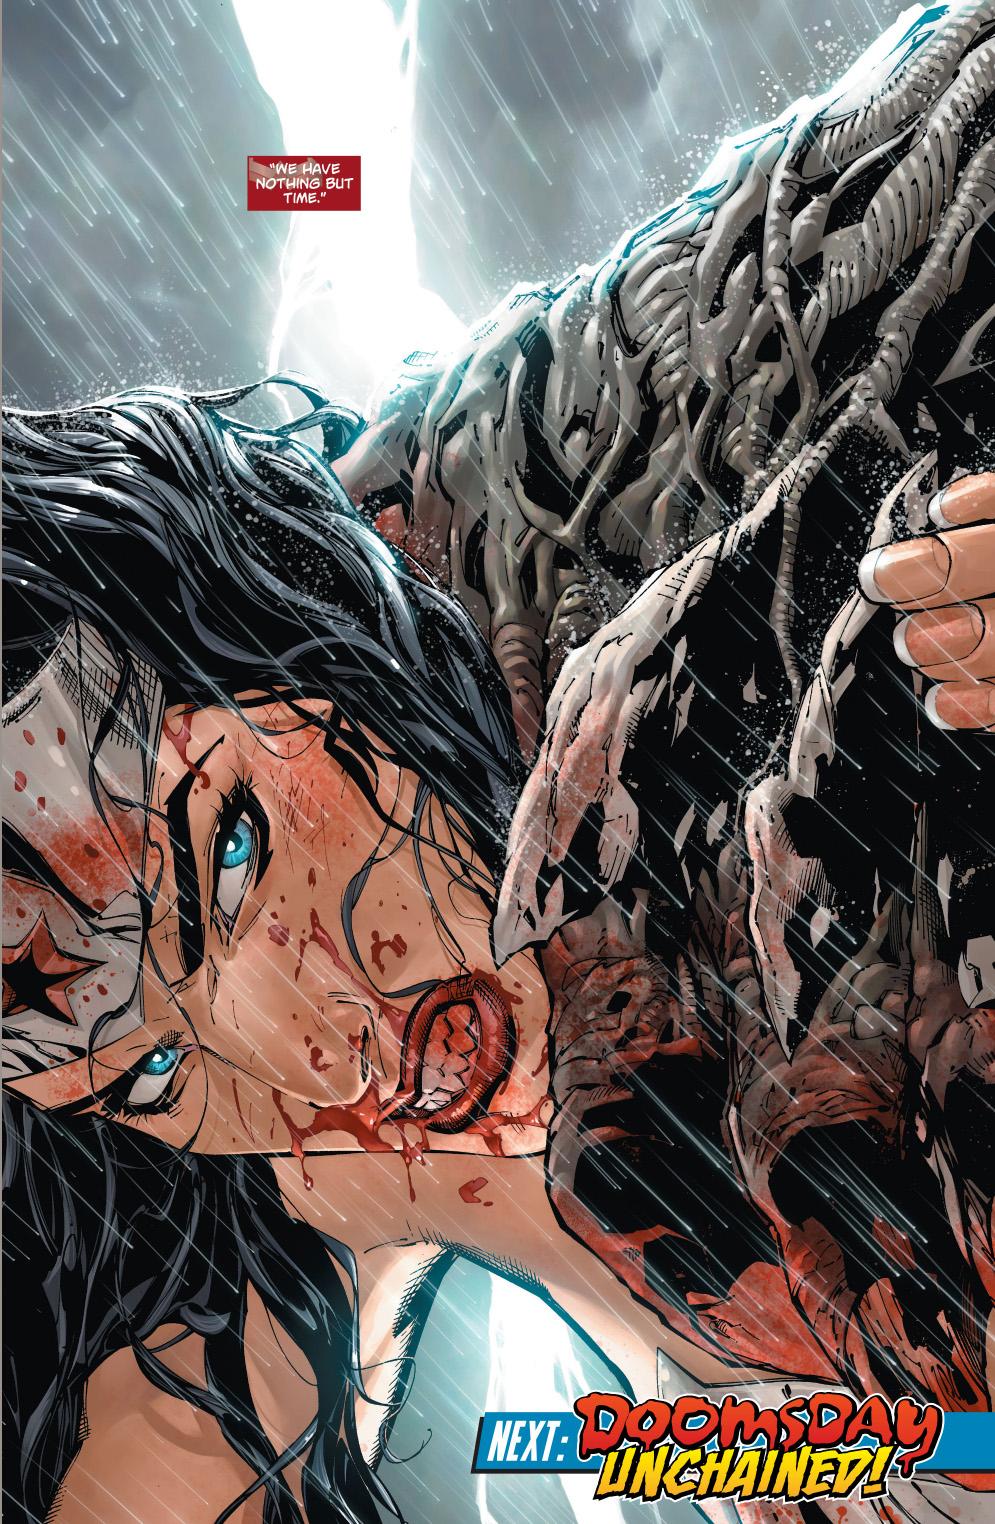 Wonder Woman Vs Doomsday New 52  Comicnewbies-4585